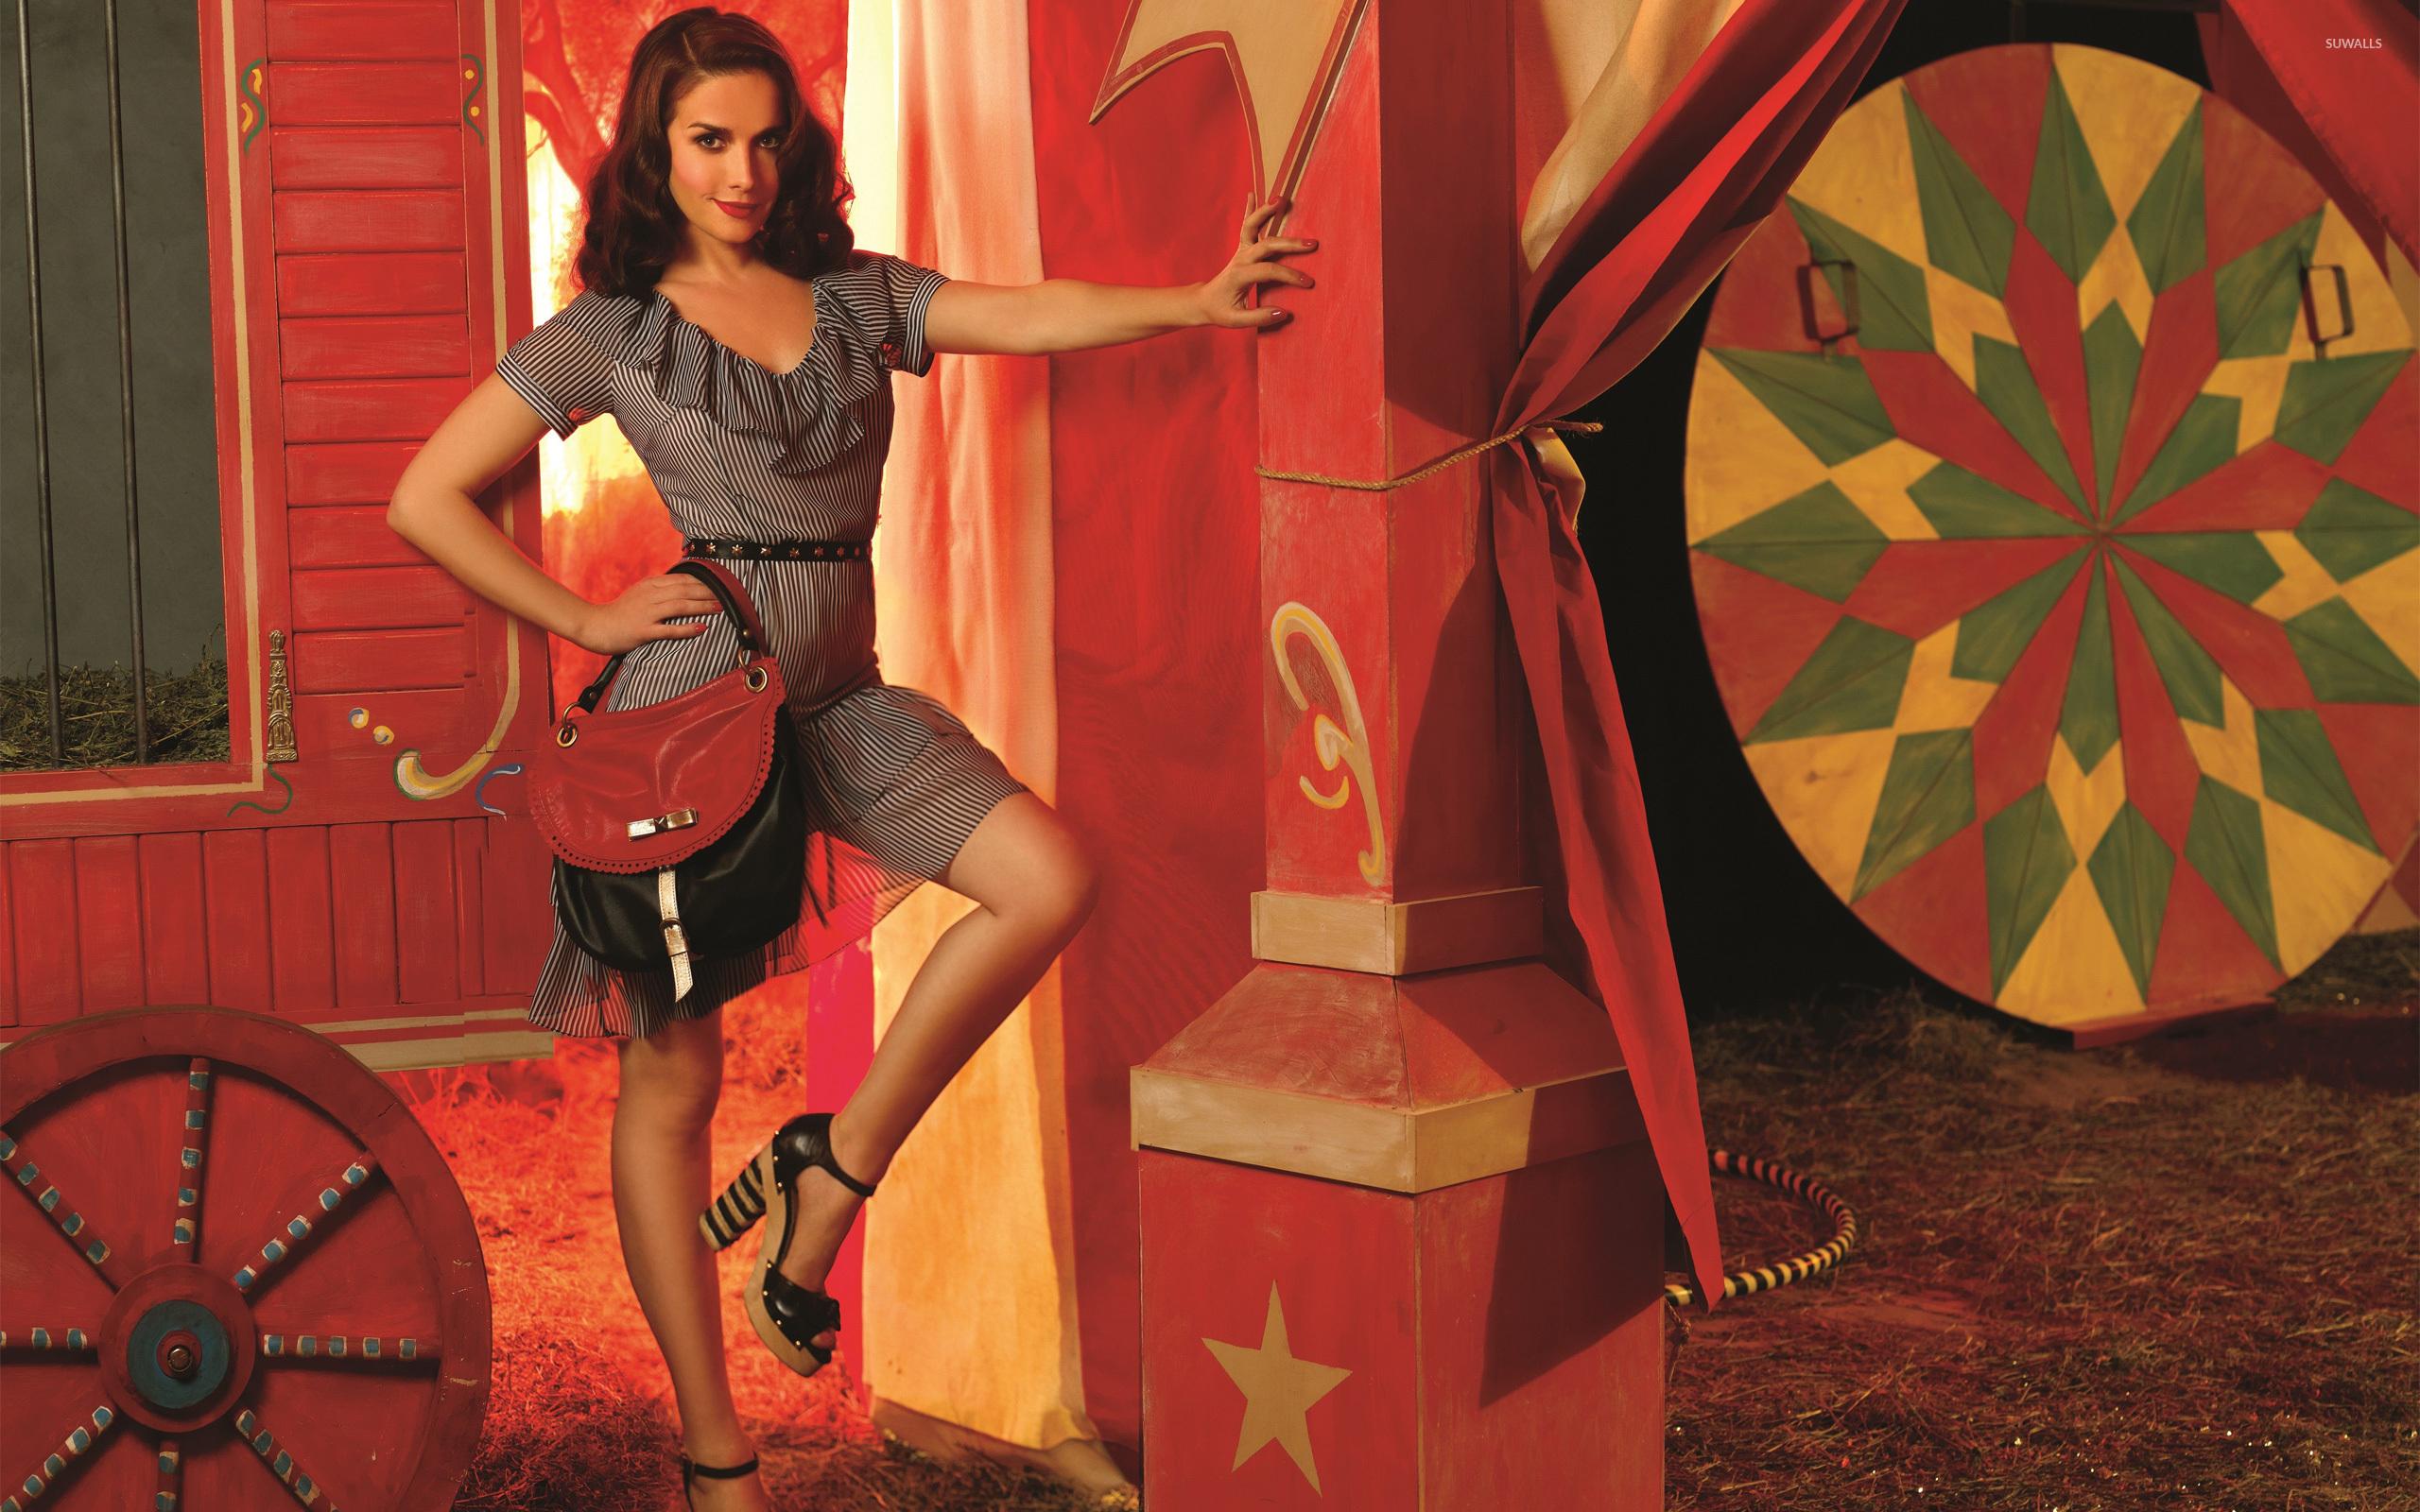 Girl Generation Wallpaper Hd Natalia Oreiro 4 Wallpaper Celebrity Wallpapers 6513